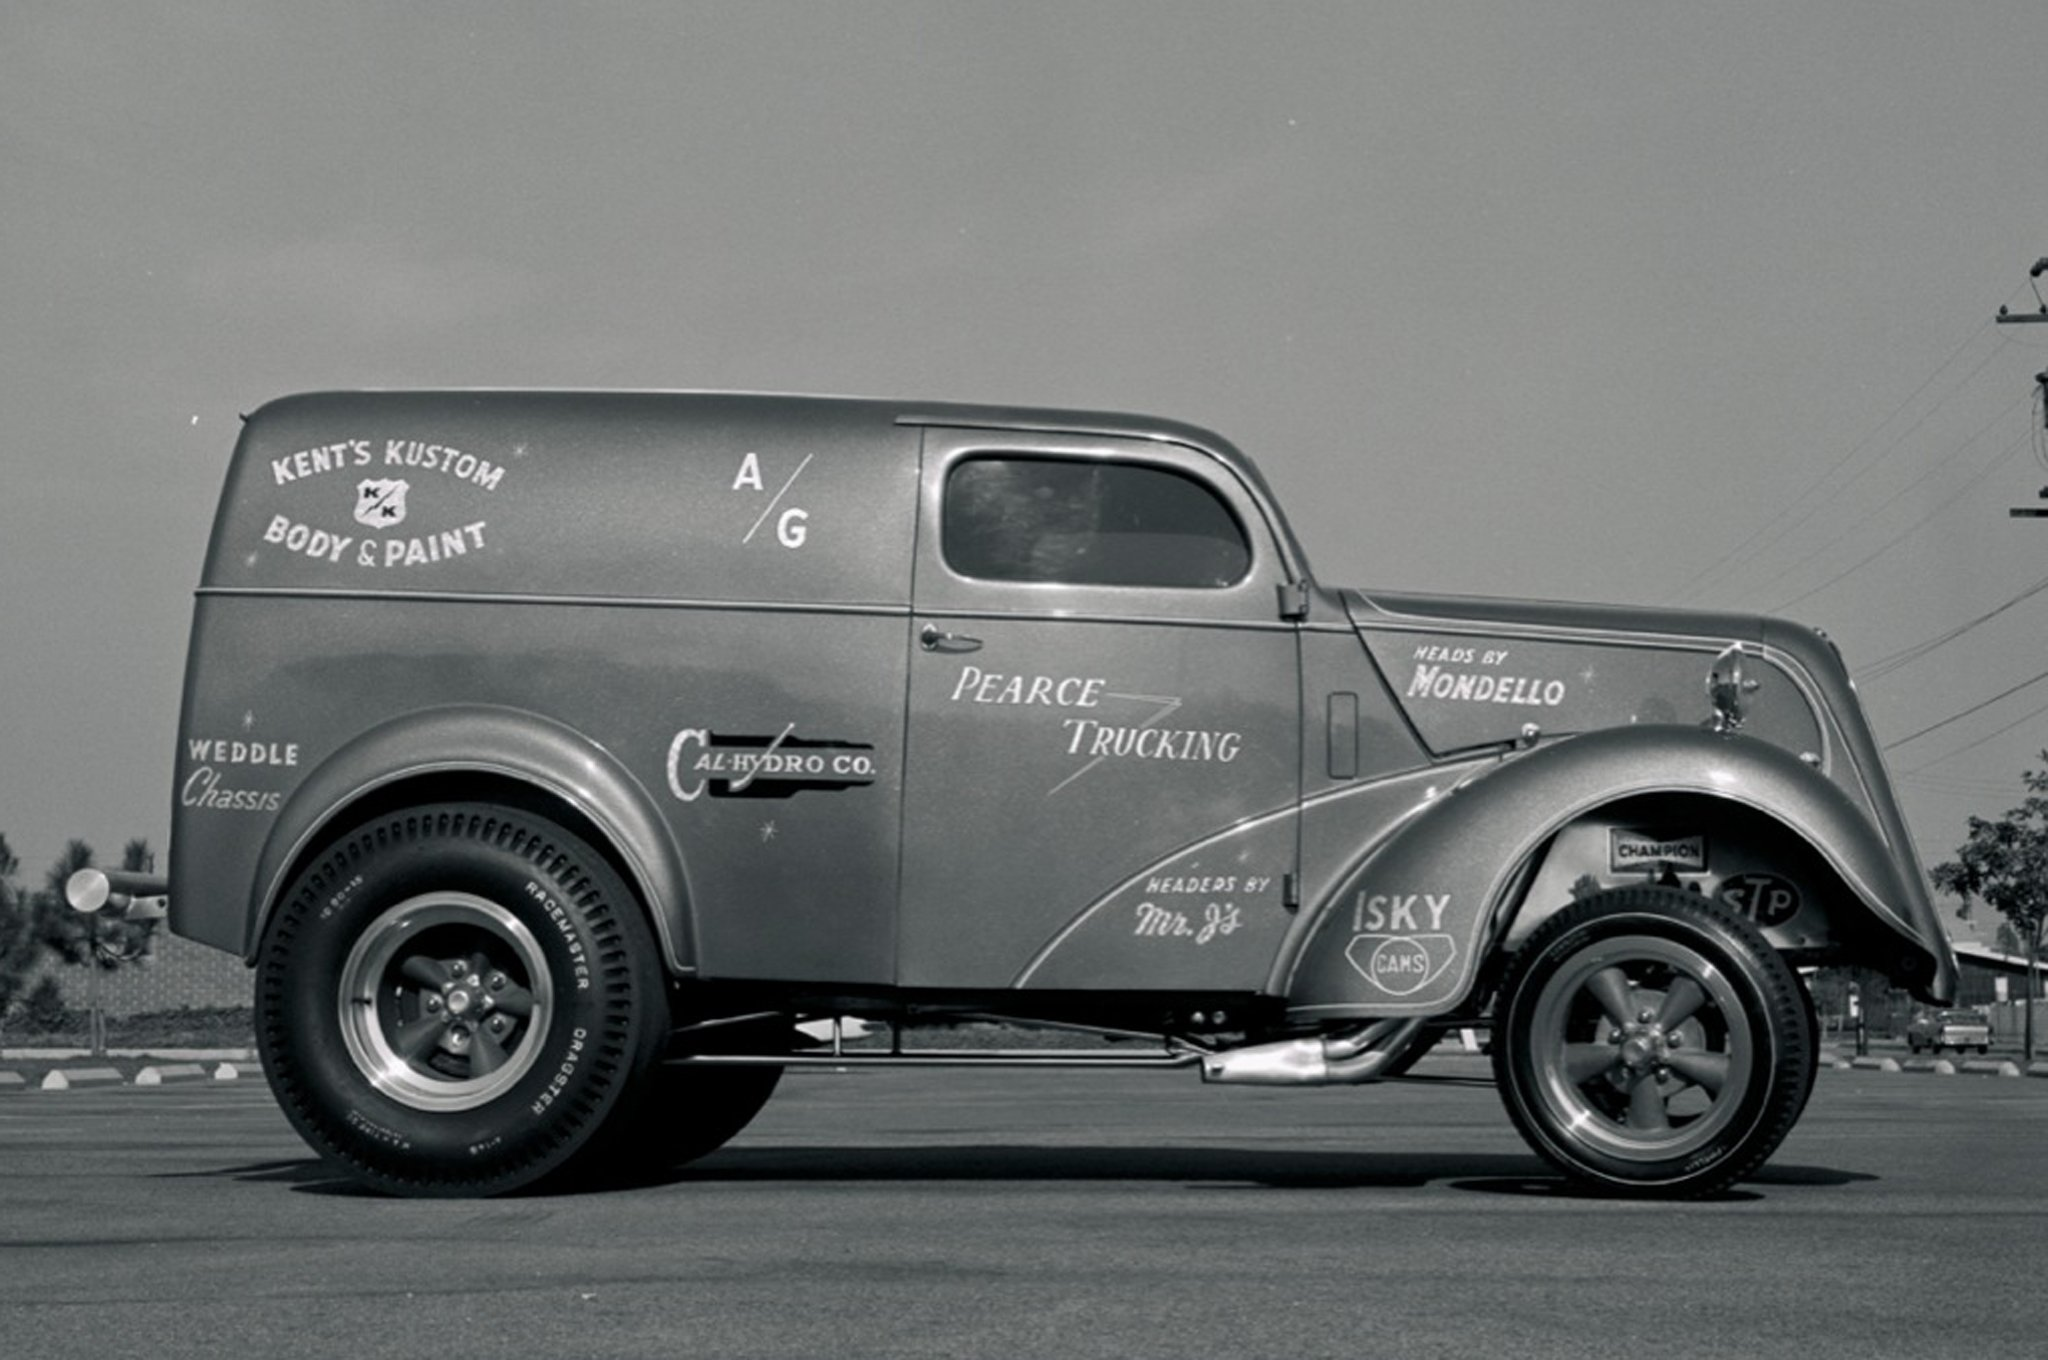 ... truck drag racing race hot rod rods gasser f wallpaper background